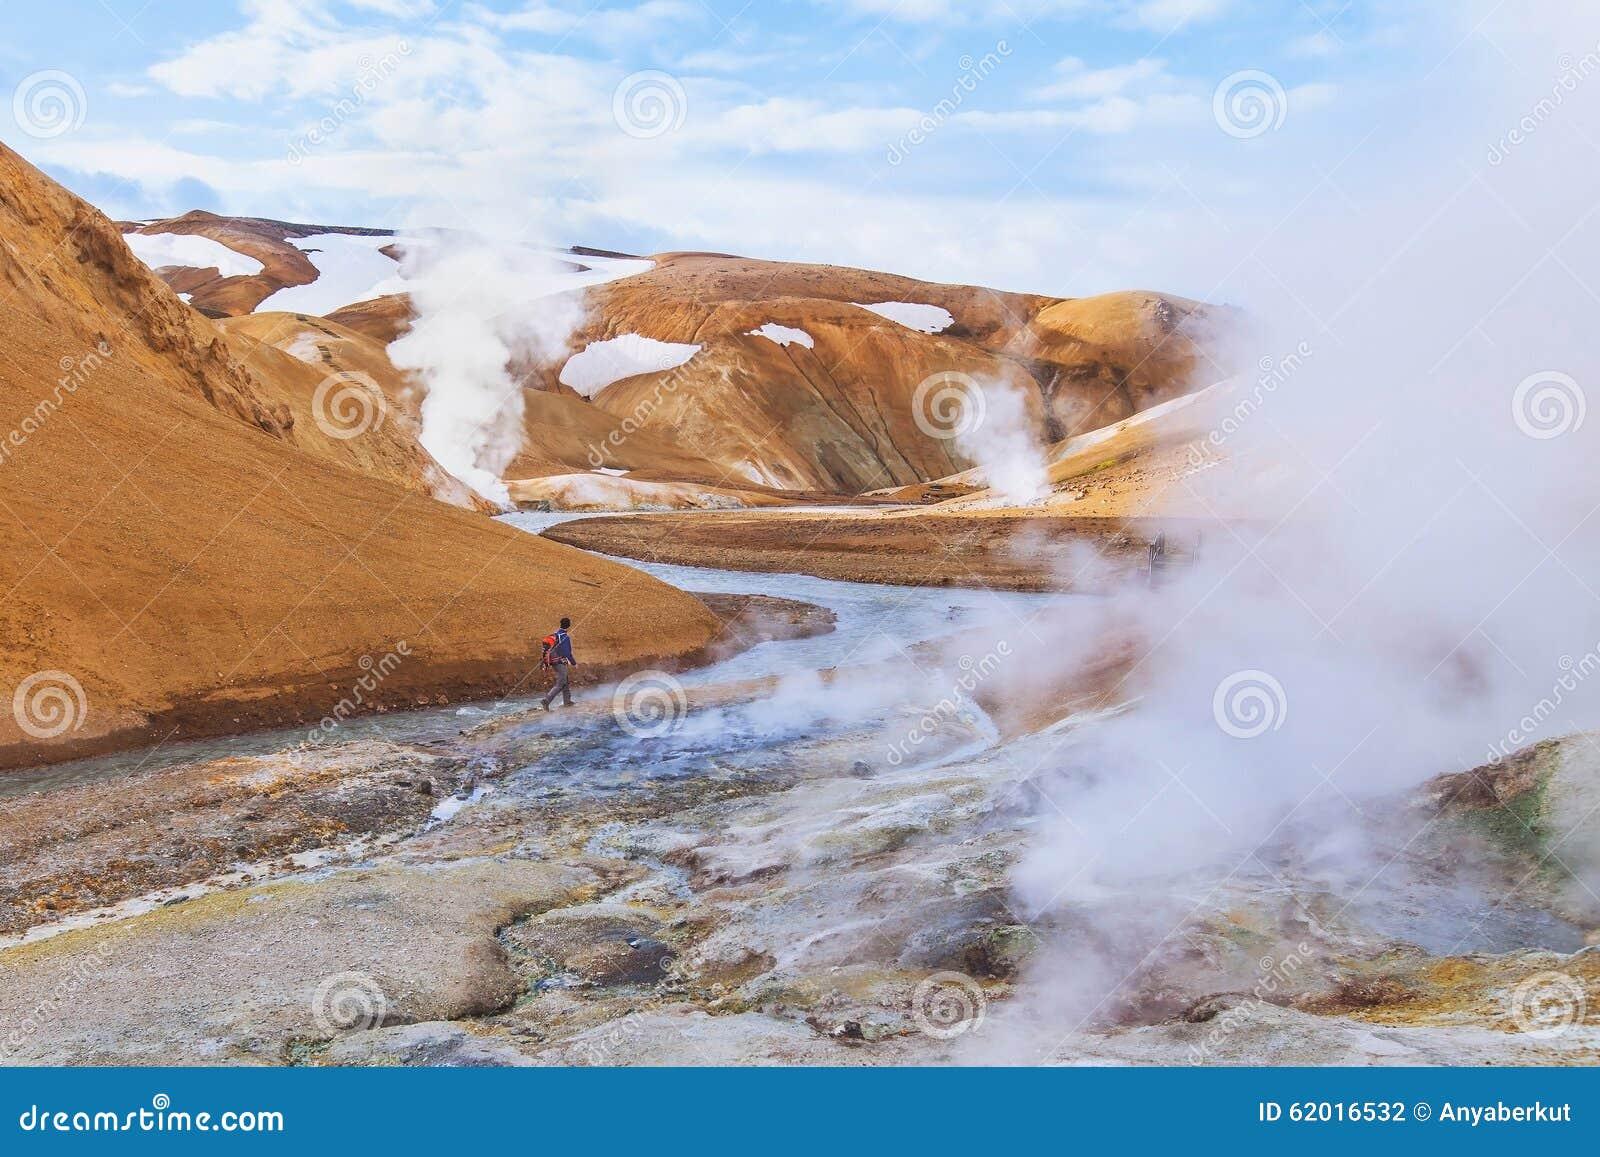 Ландшафт луны от Исландии